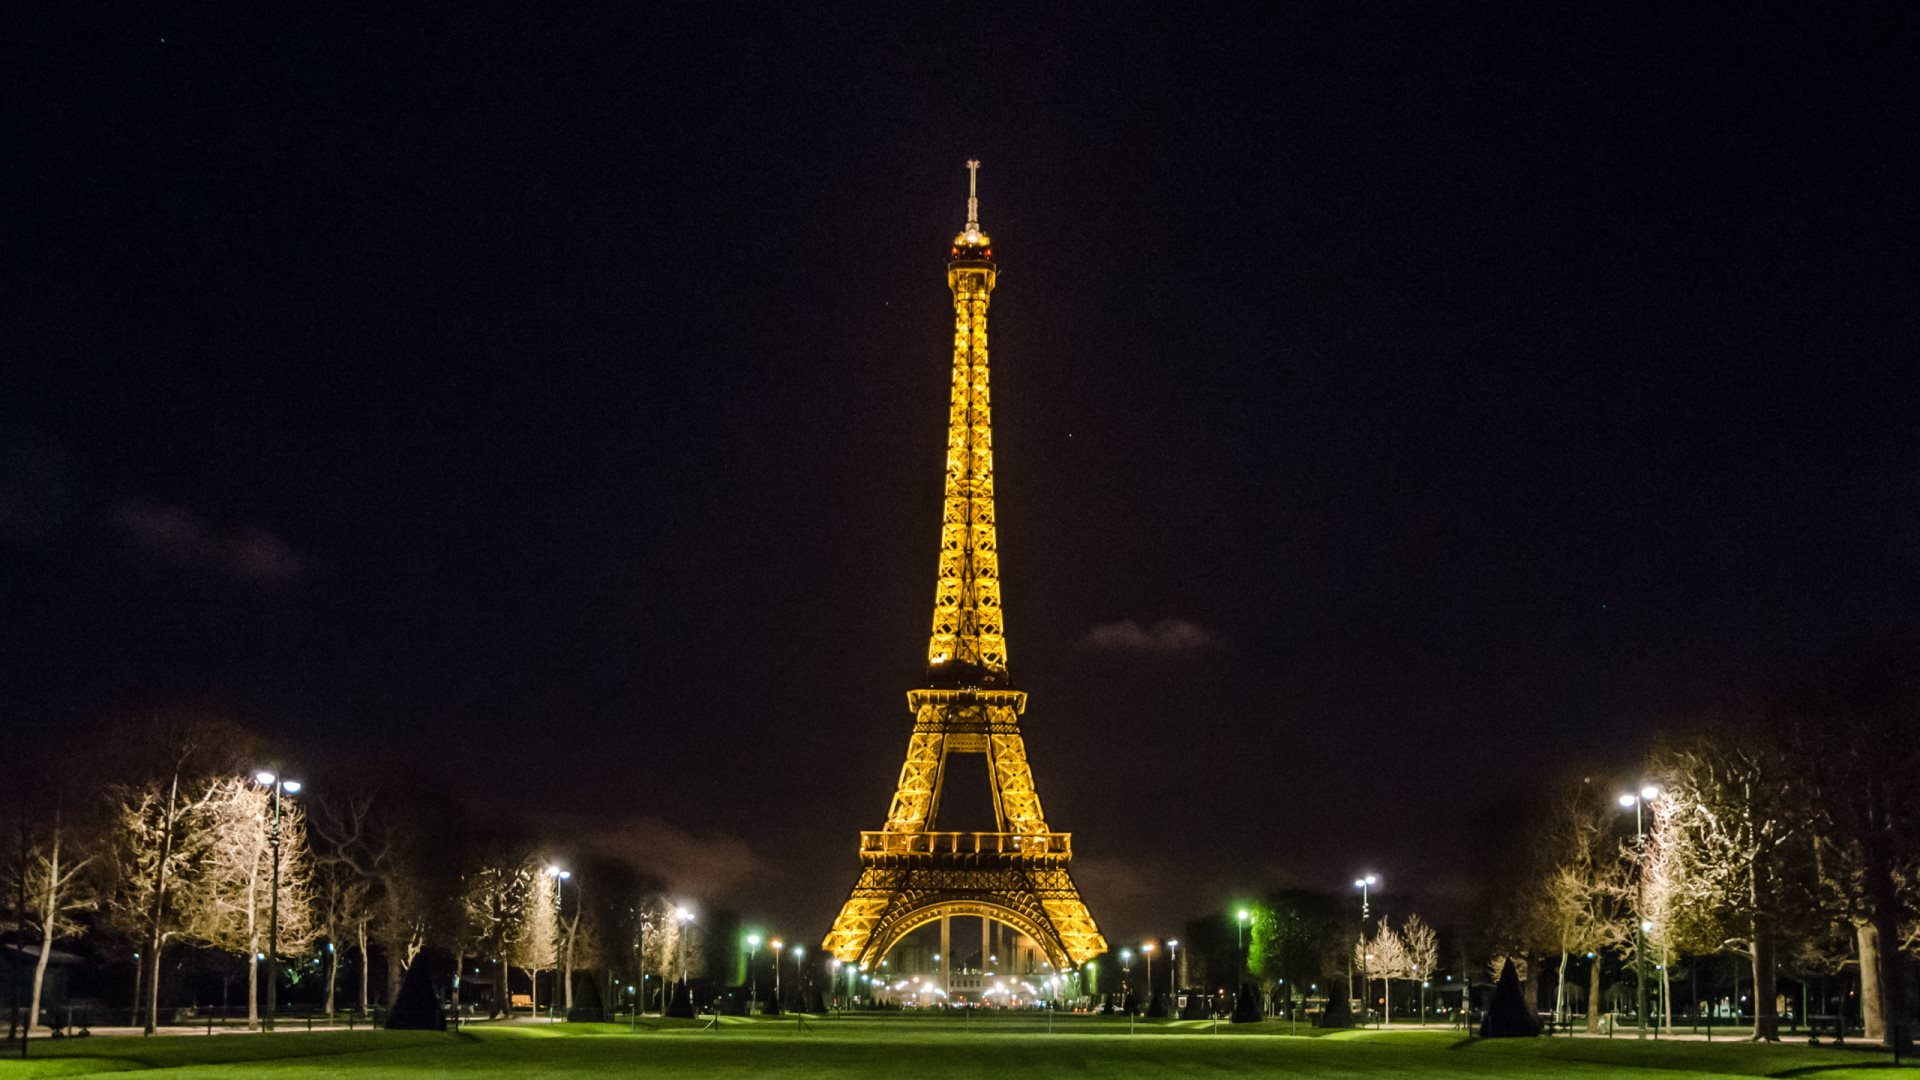 72 Eiffel Tower At Night Wallpaper On Wallpapersafari